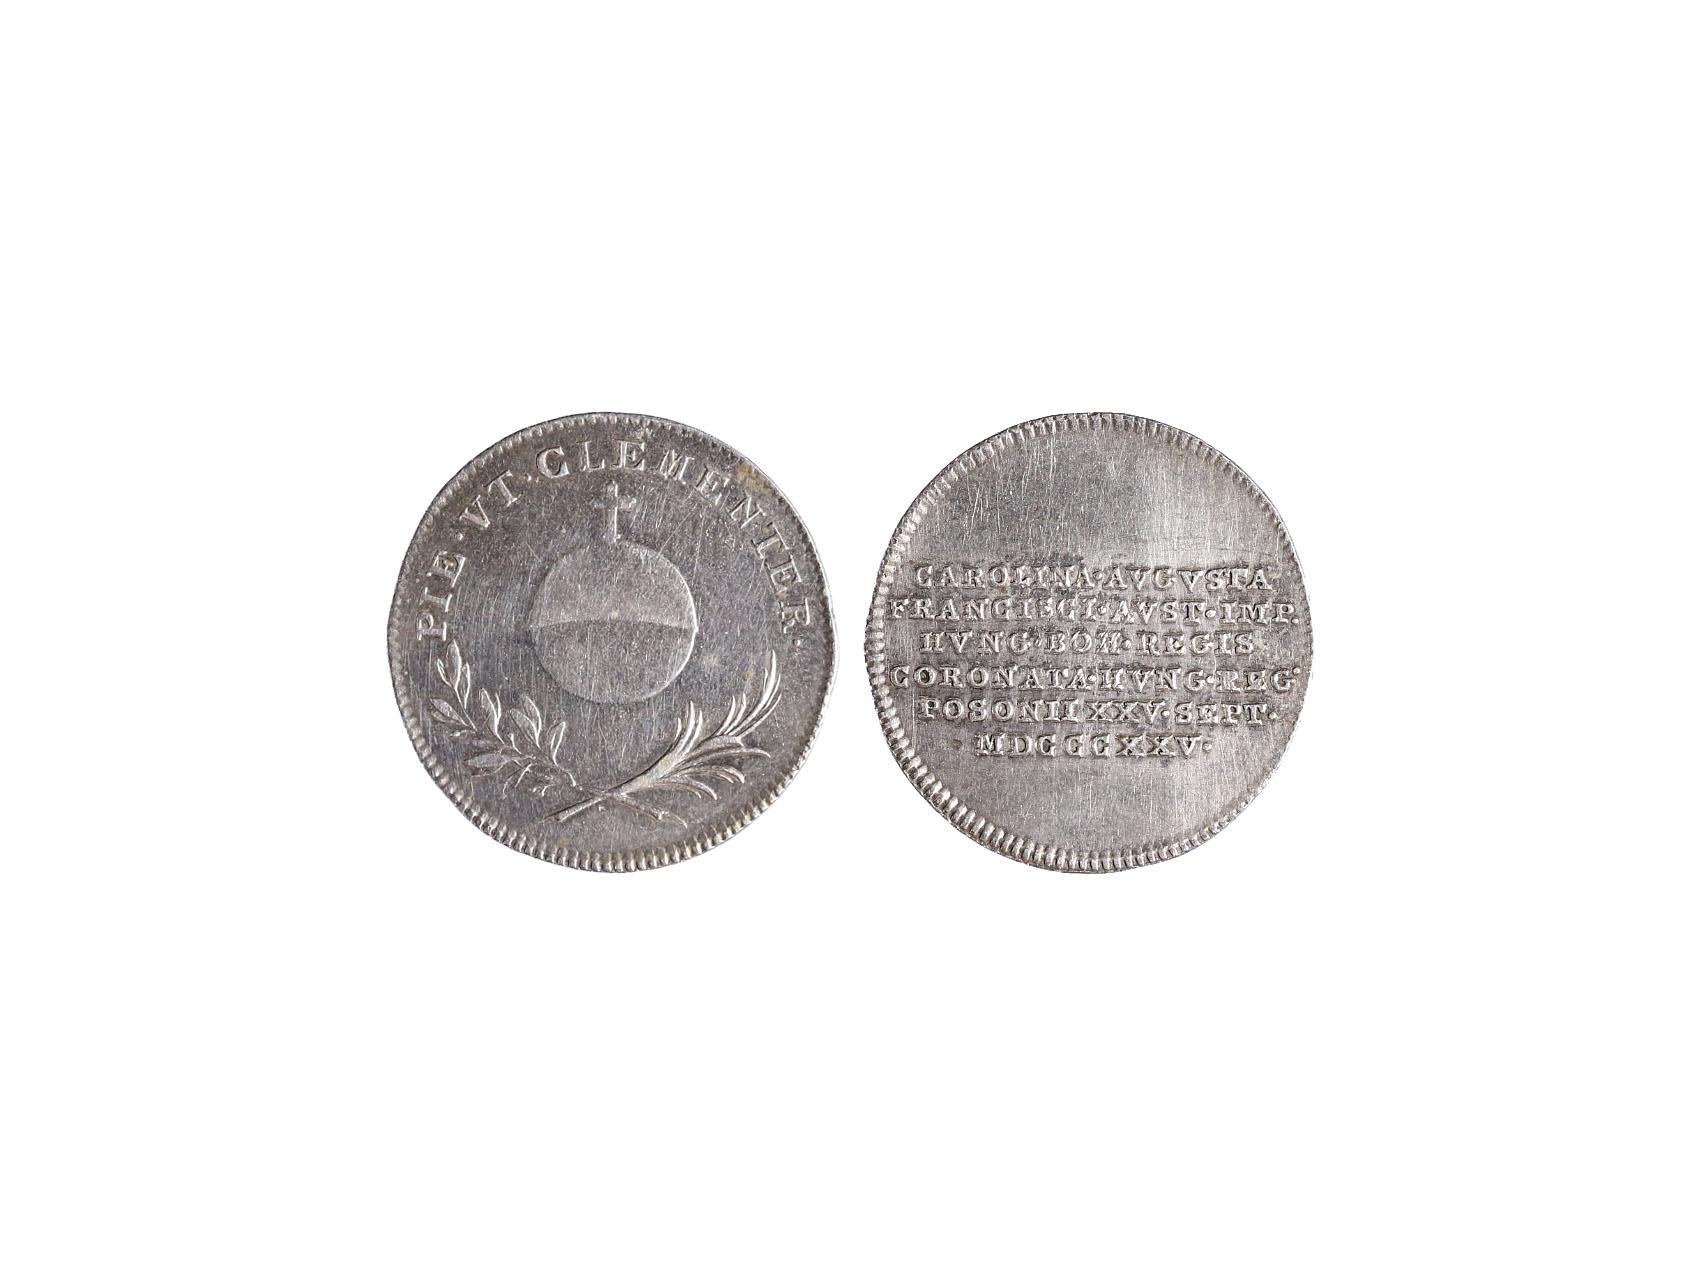 Osobnosti - František I. 1792-1835 - AR Malý žeton 1825 na maďarskou korunovaci v Bratislavě, Mont. 2499